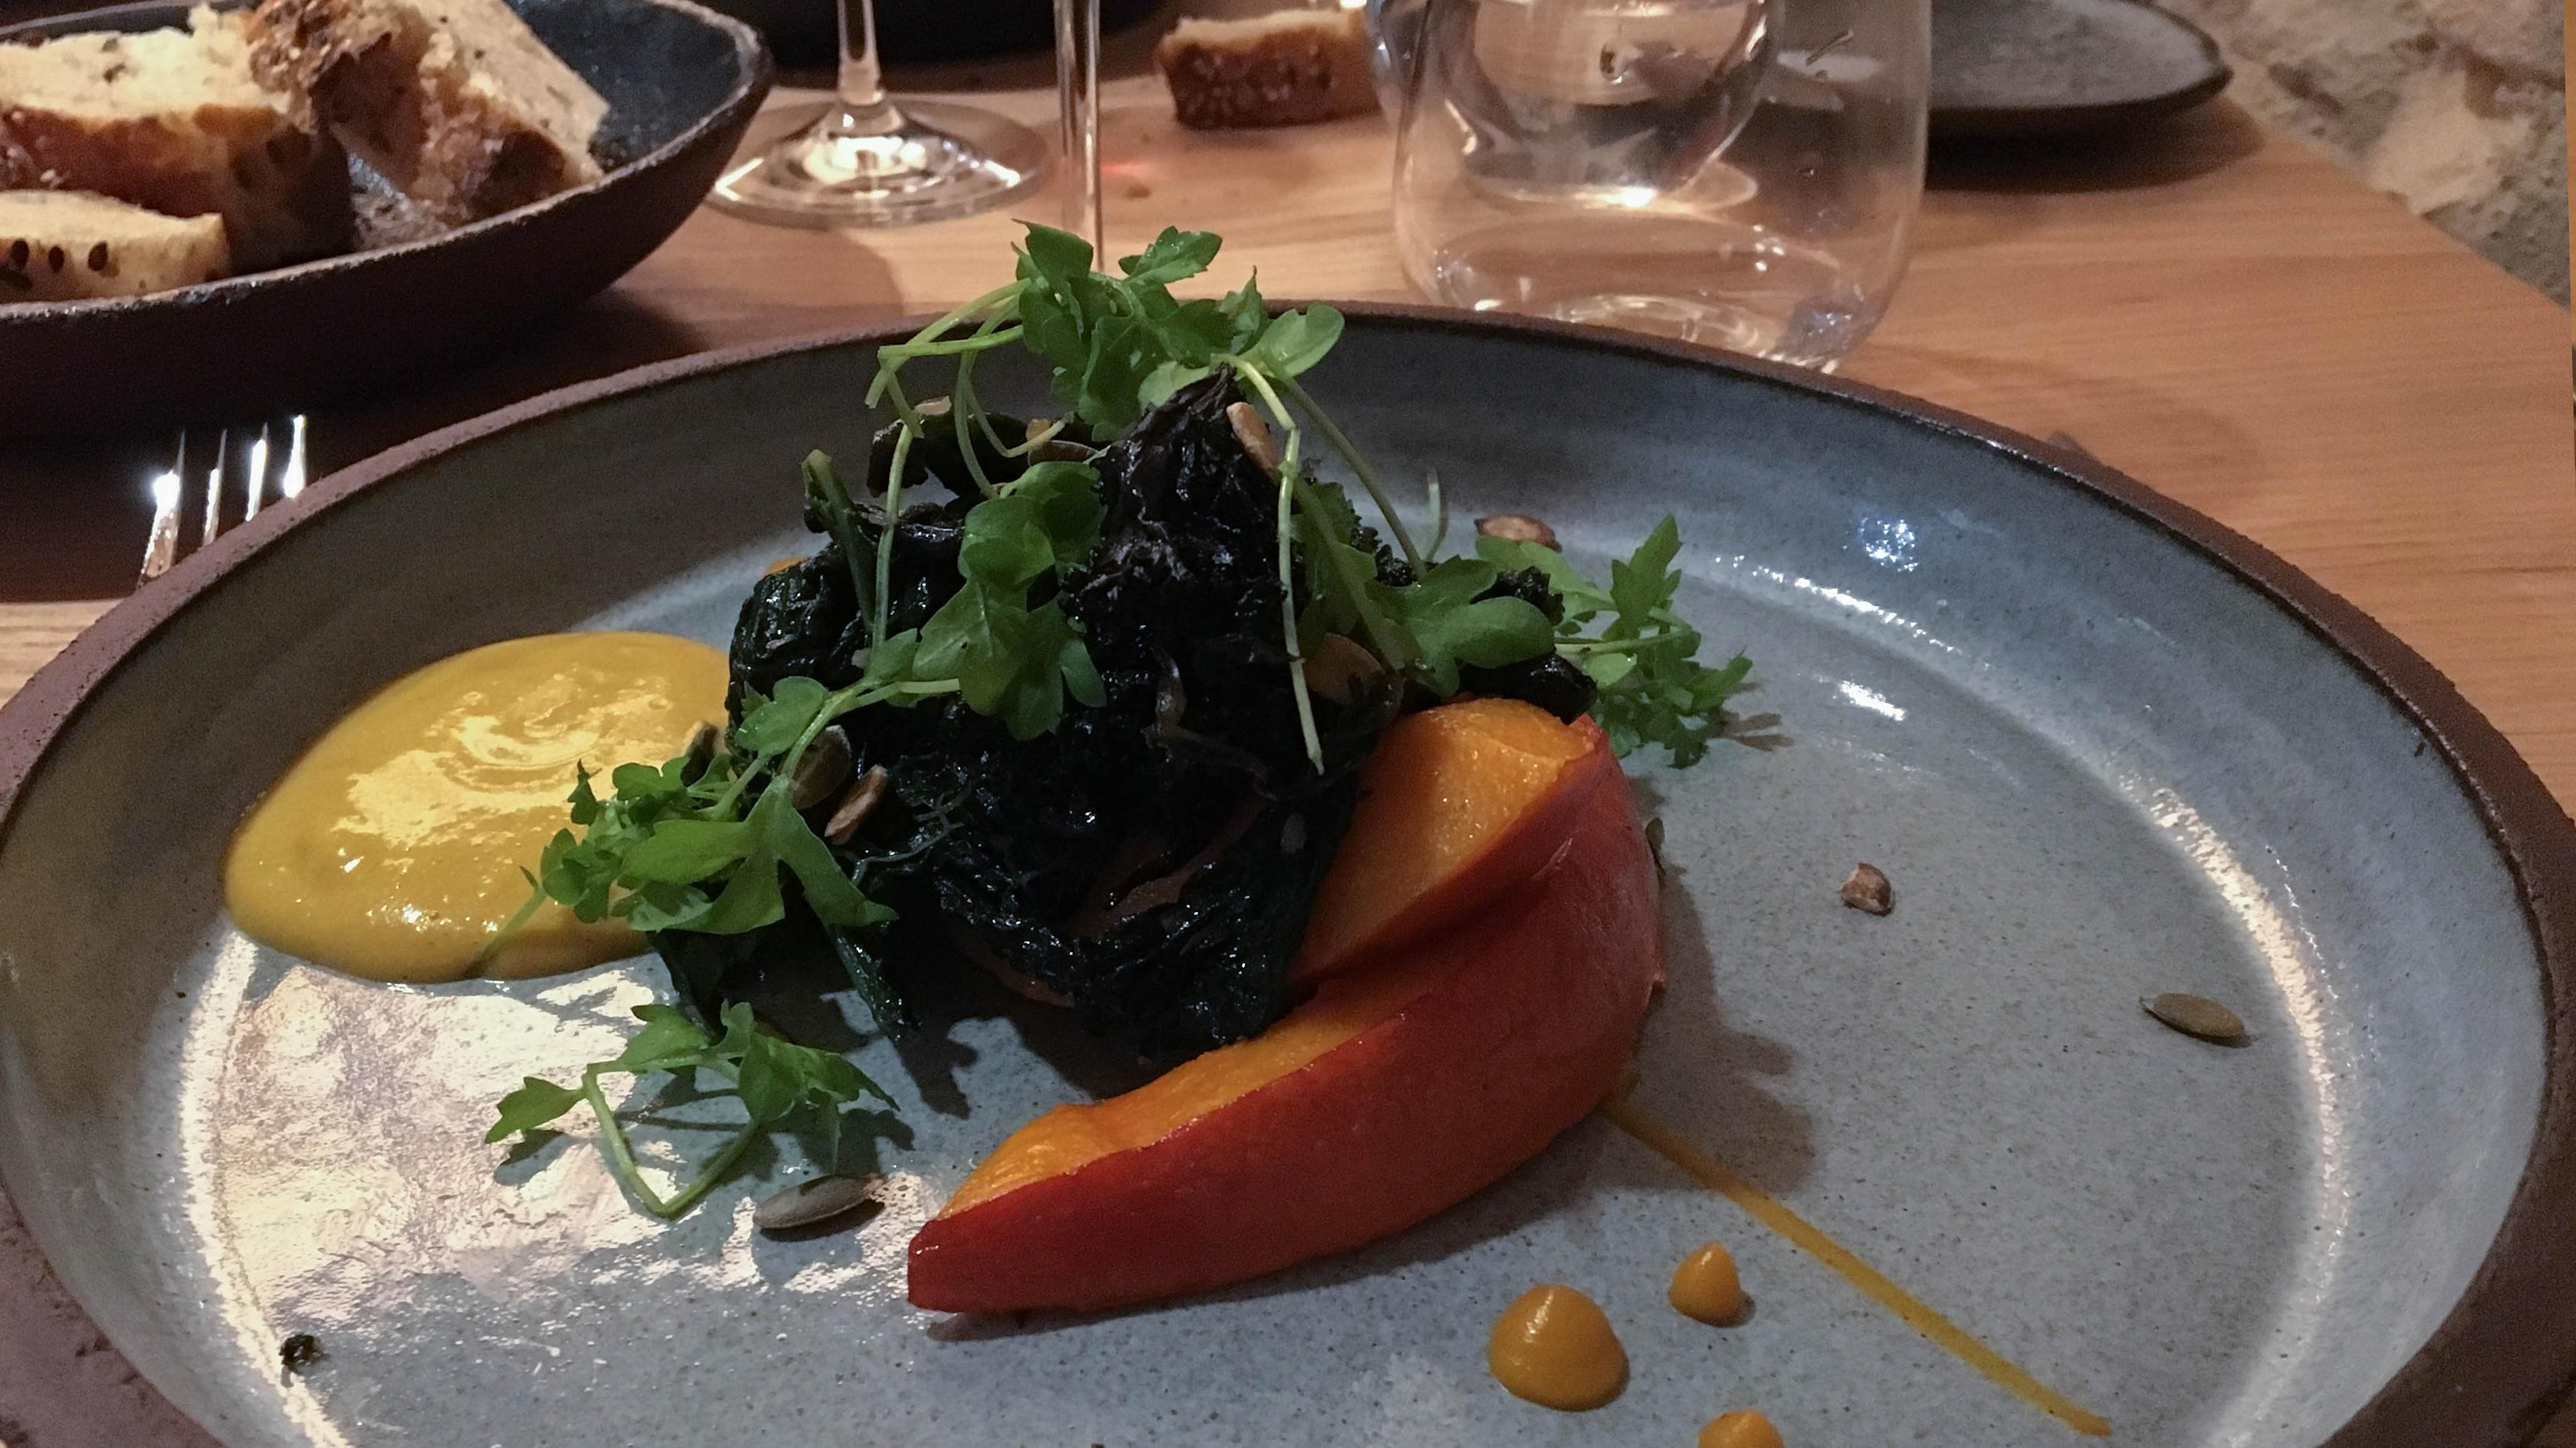 Culina Hortus - Potimarron